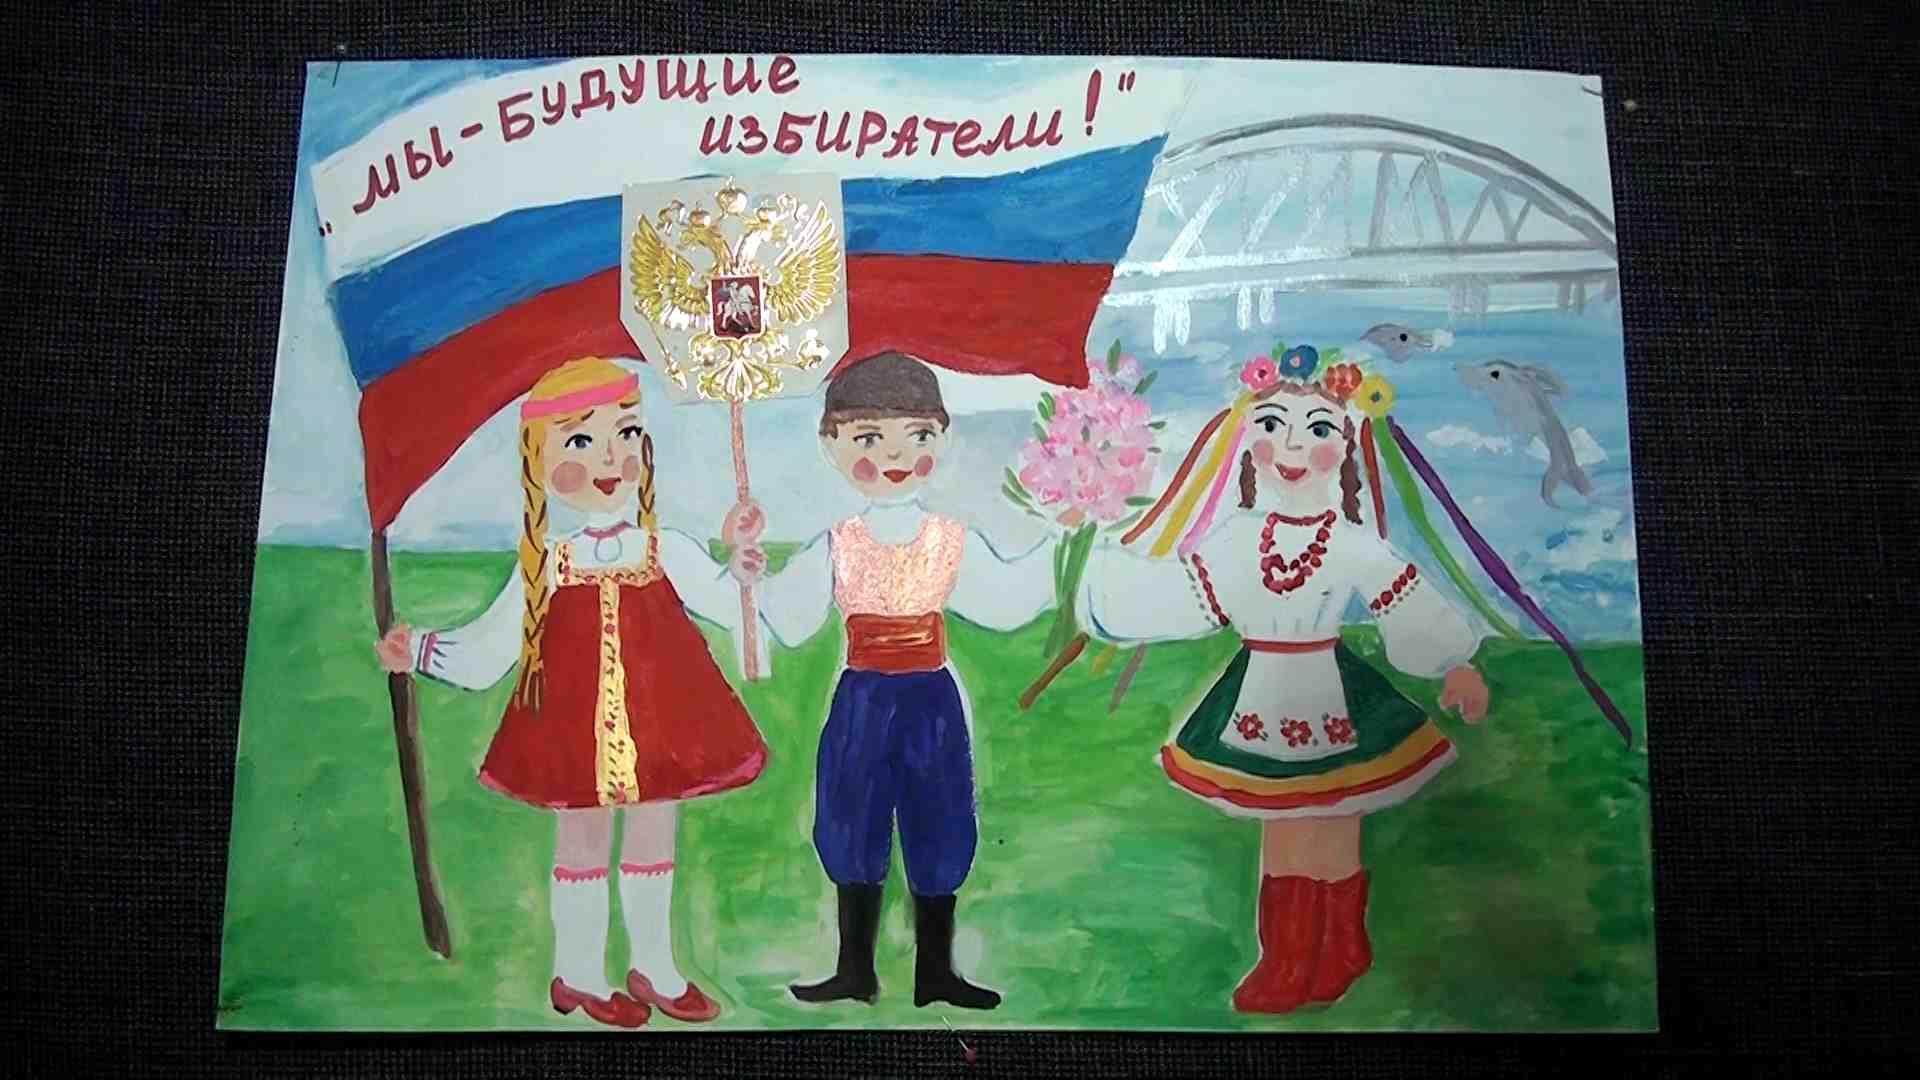 my vmeste pod flagom rossii. dzhankoj ckid - Мы вместе под флагом России /22.08